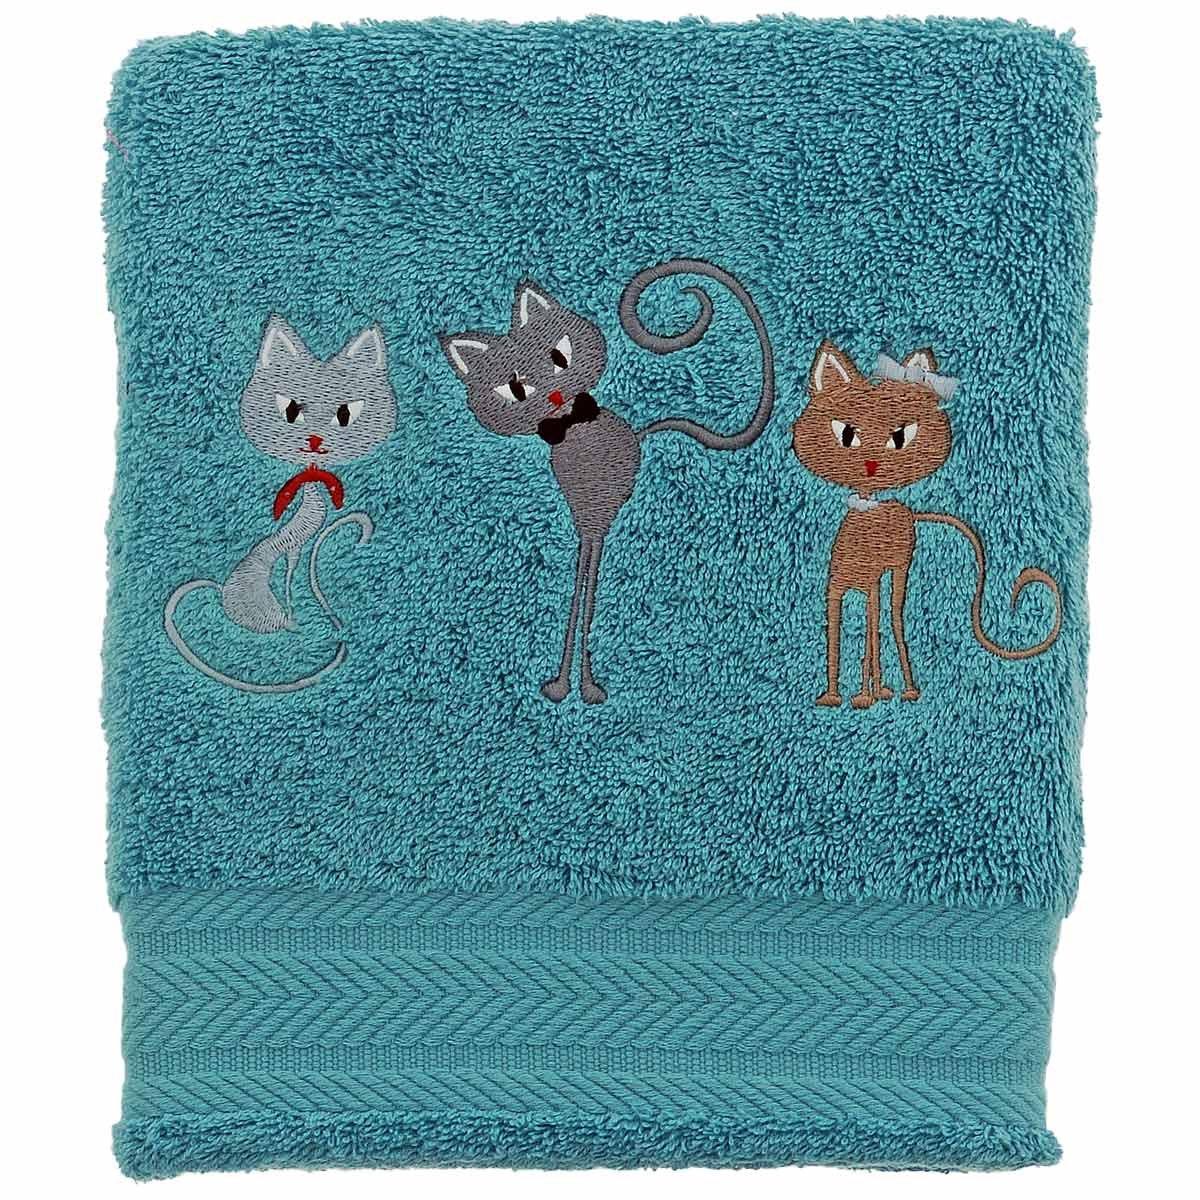 Toalla invitados 30x 50cm bordado Cats, Aqua, 30 x 50 SENSEI La Maison du Coton